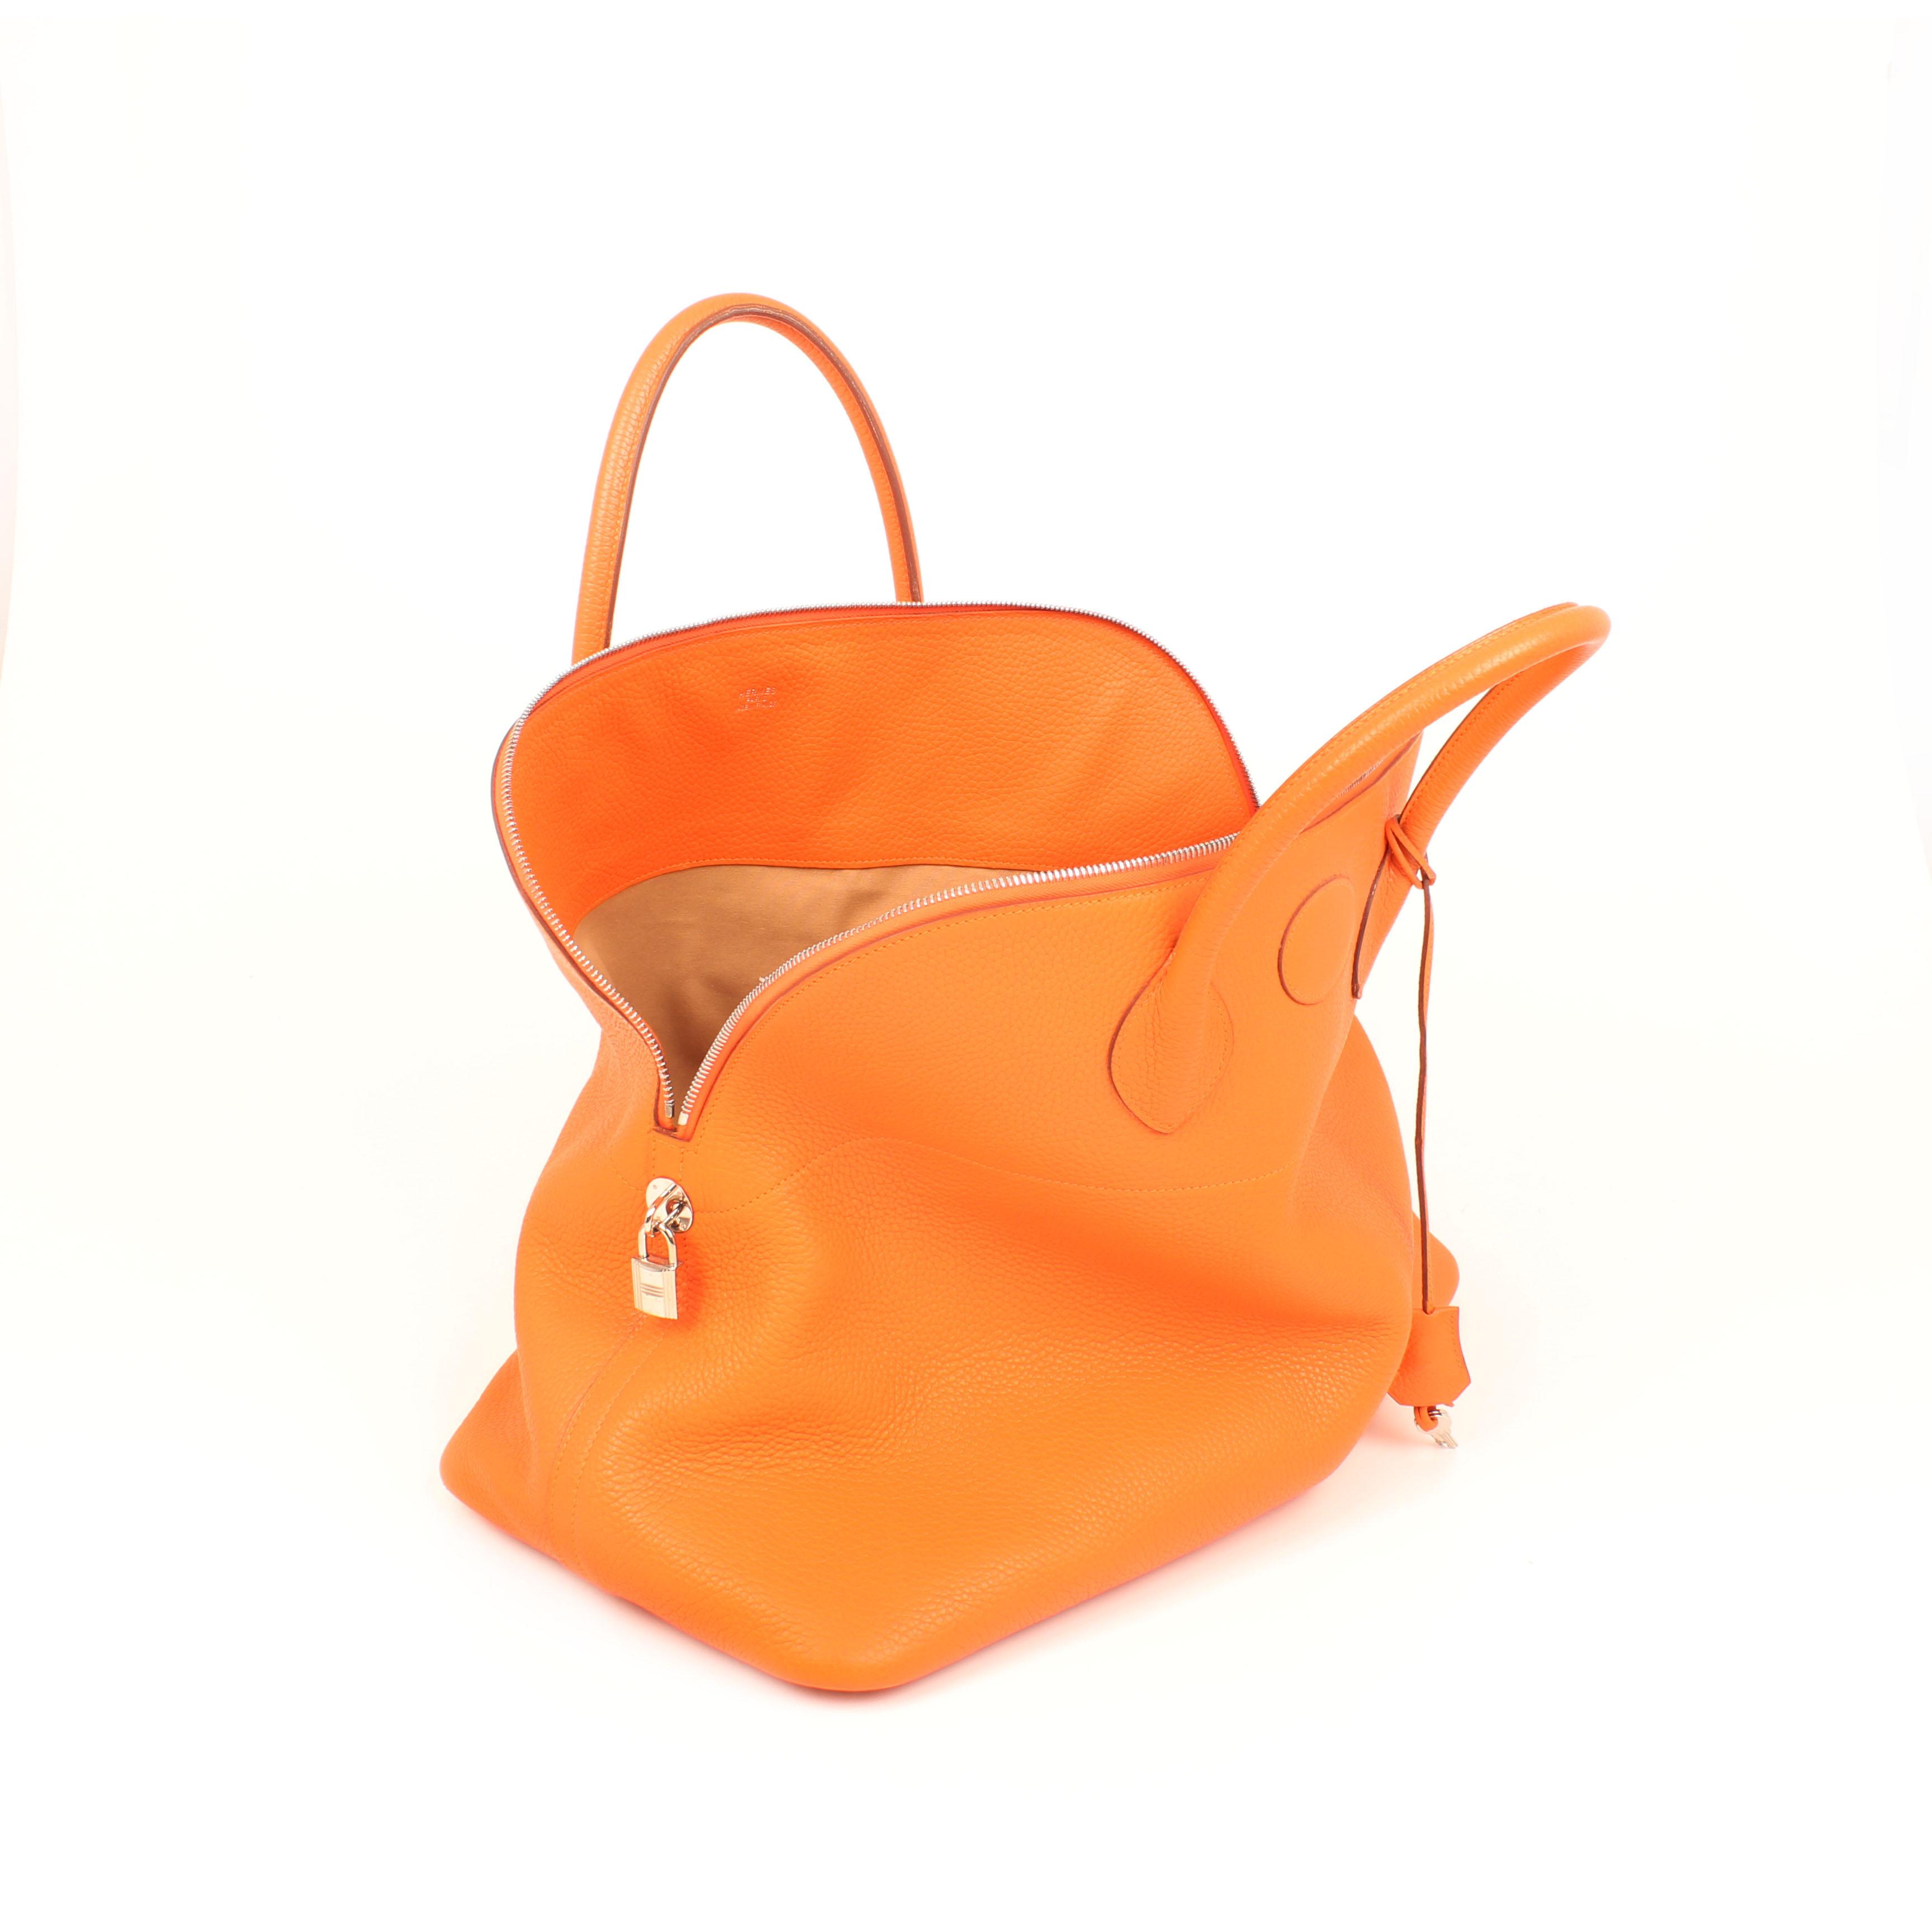 bolsa de viaje hermes bolide 45 piel togo naranja abierto